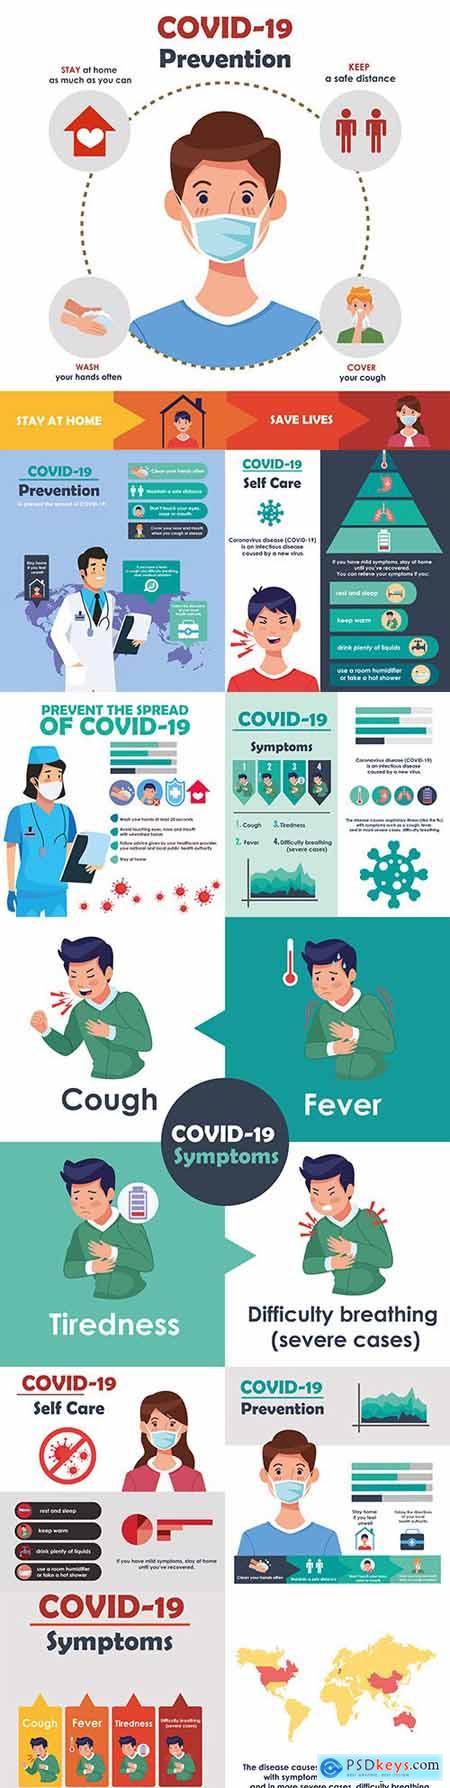 Covid-19 prevention methods and disease imptomas